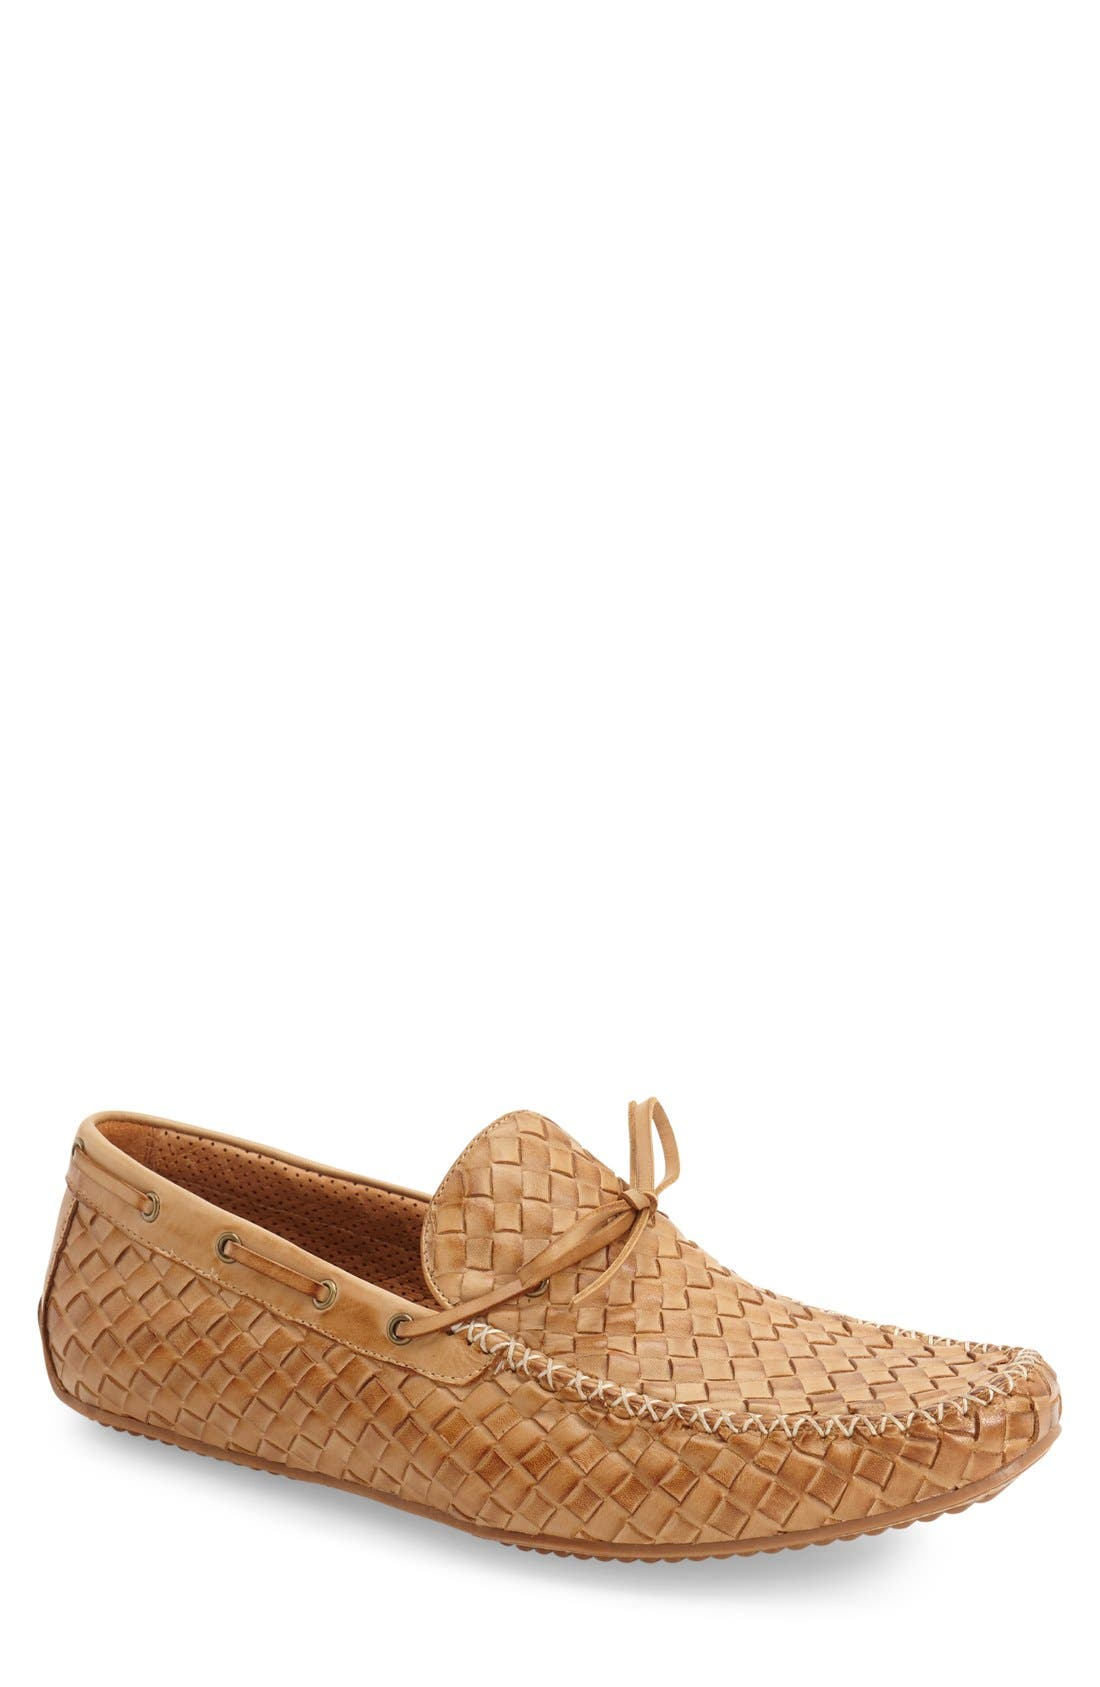 Main Image - Zanzara Leather Loafer (Men)